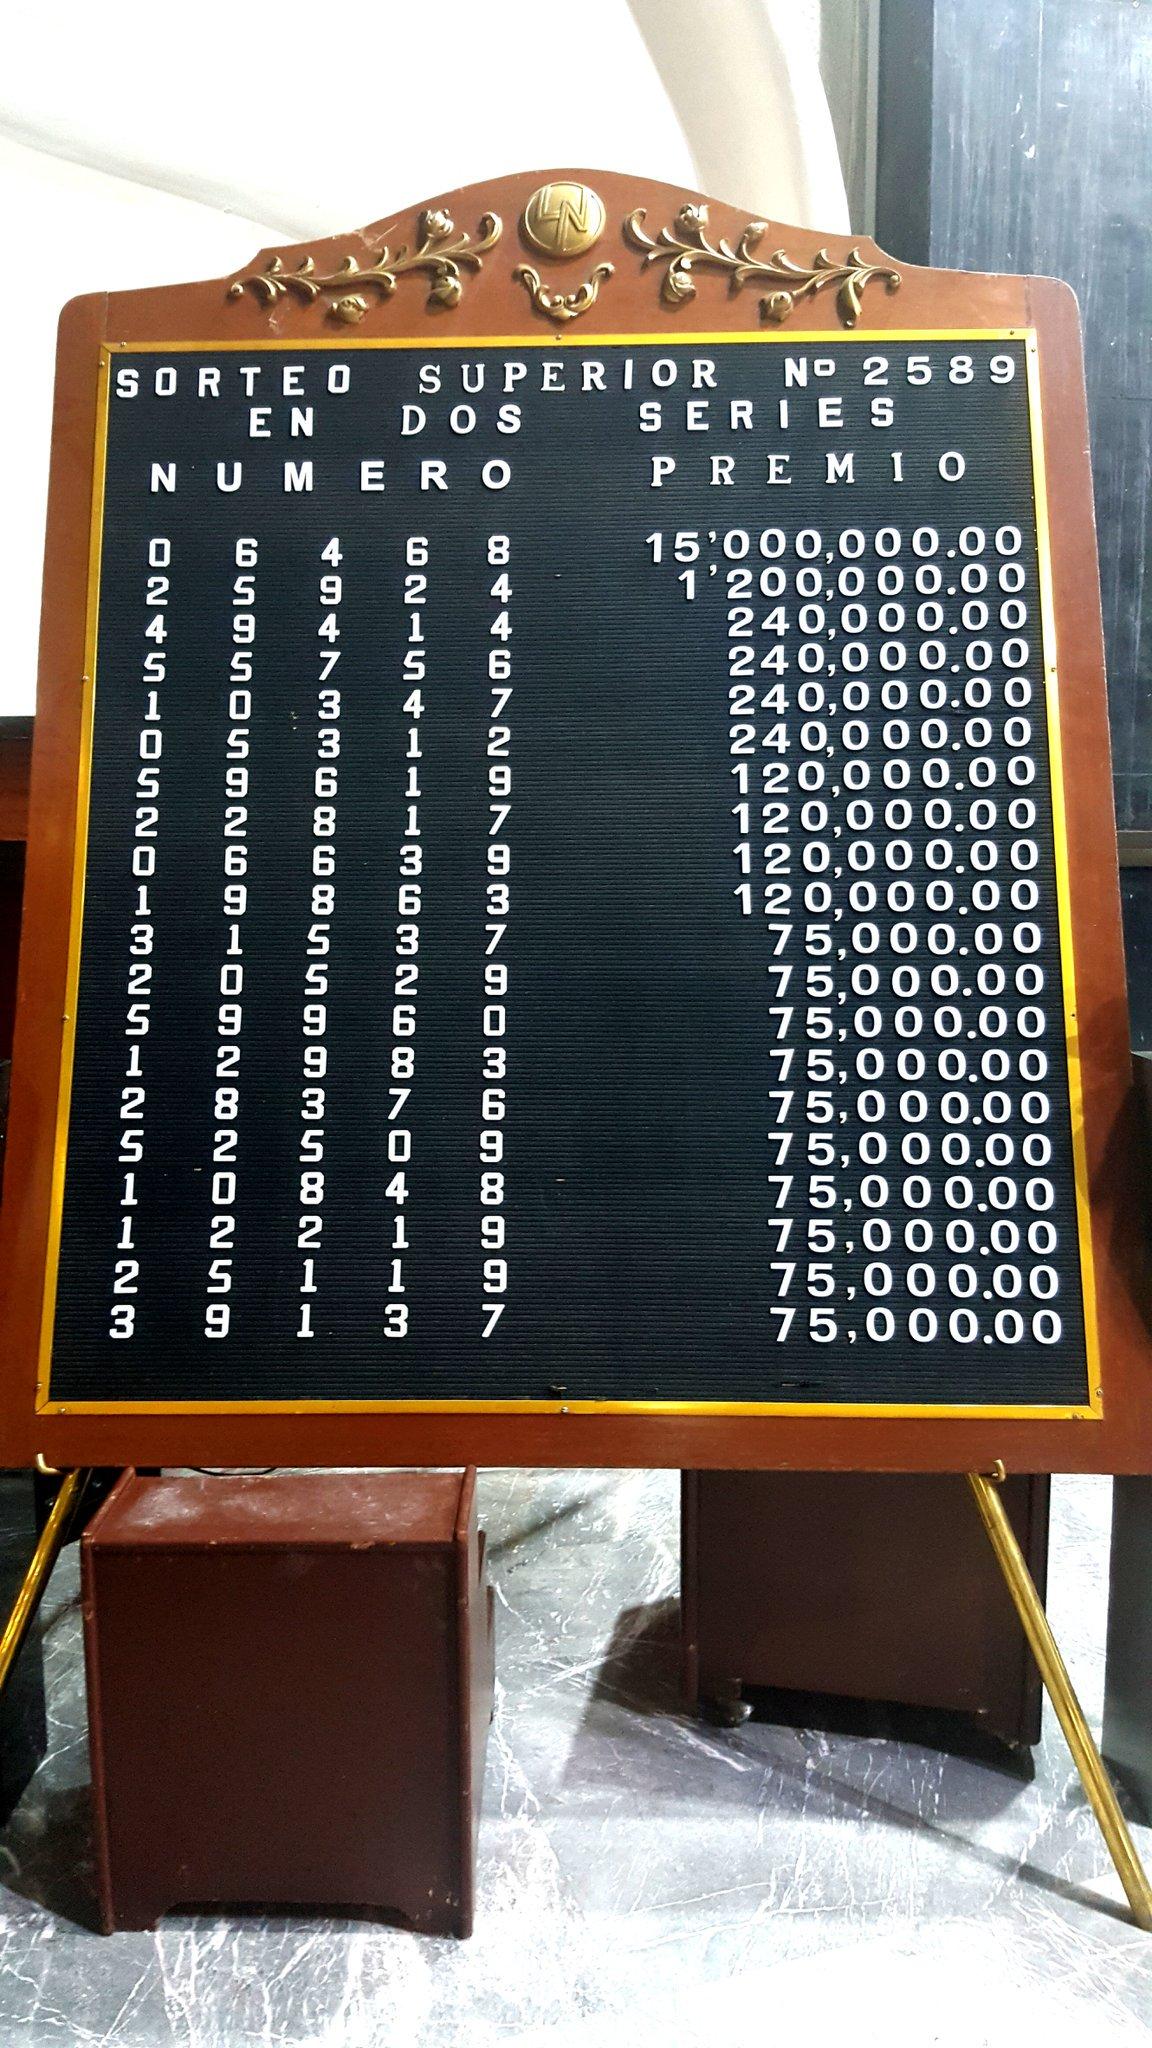 Sorteo Superior 2589